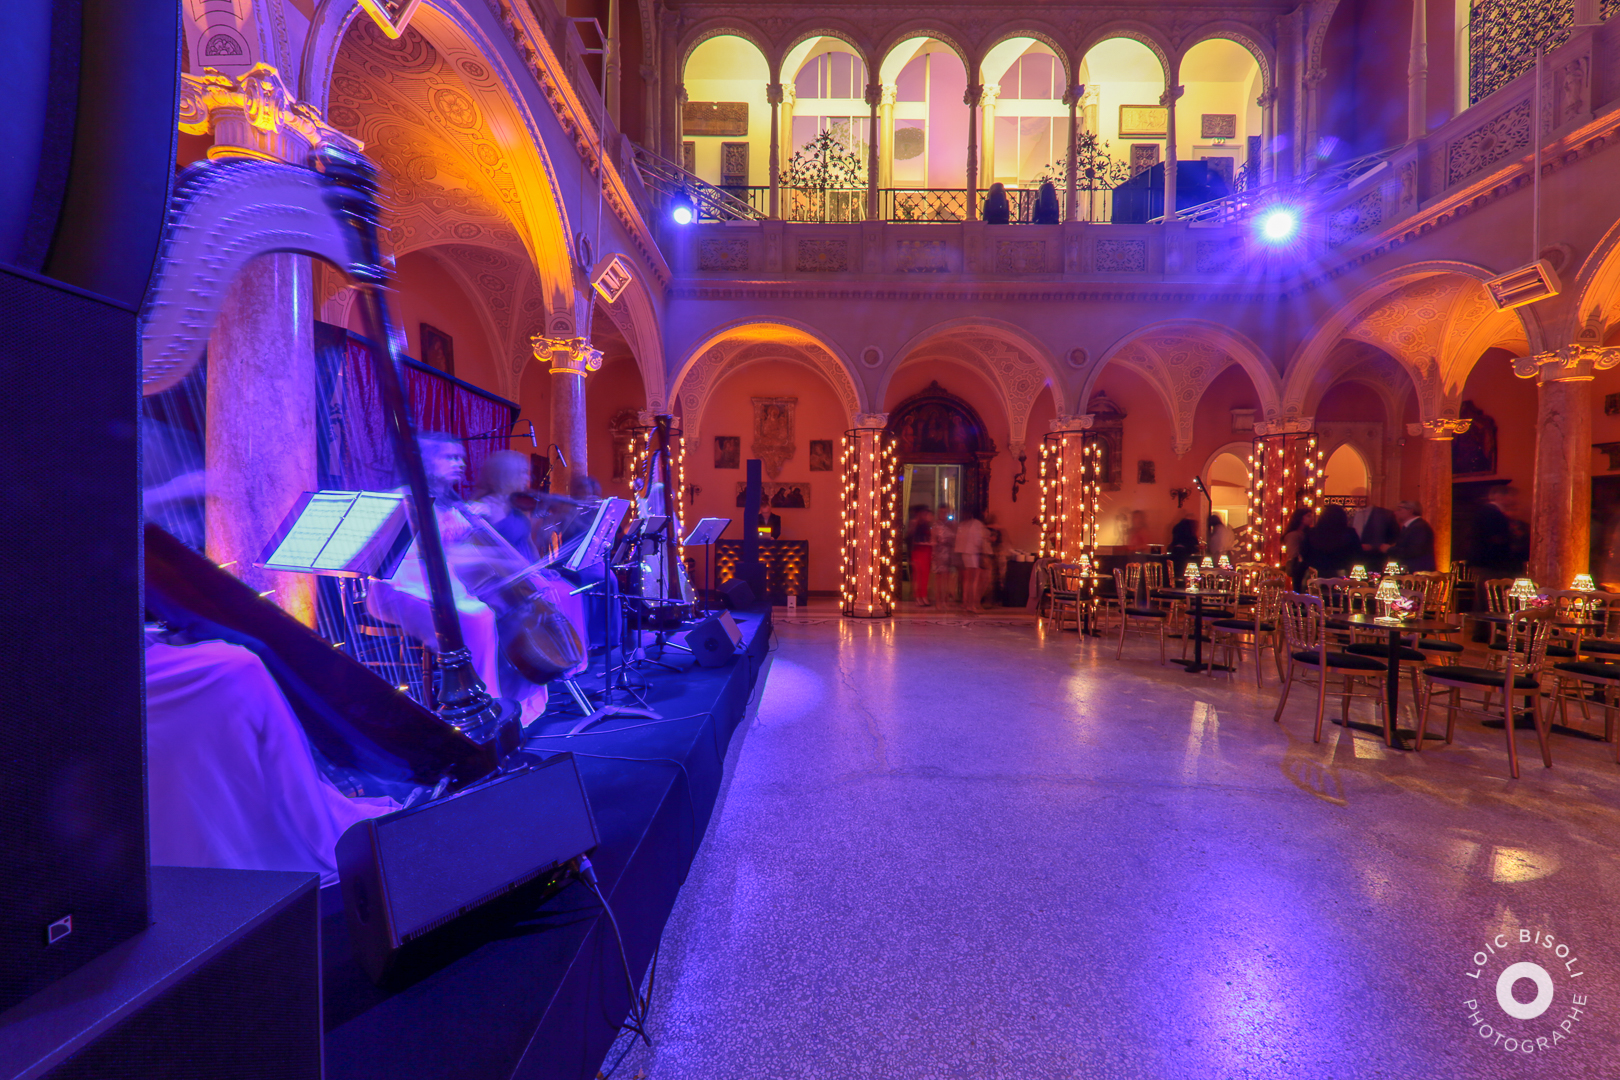 aucop-Villa Ephrussi de Rothschild-Studio Loic Bisoli-lumieres-facade-nice-soiree-saint jean cap ferrat-evenement-deco